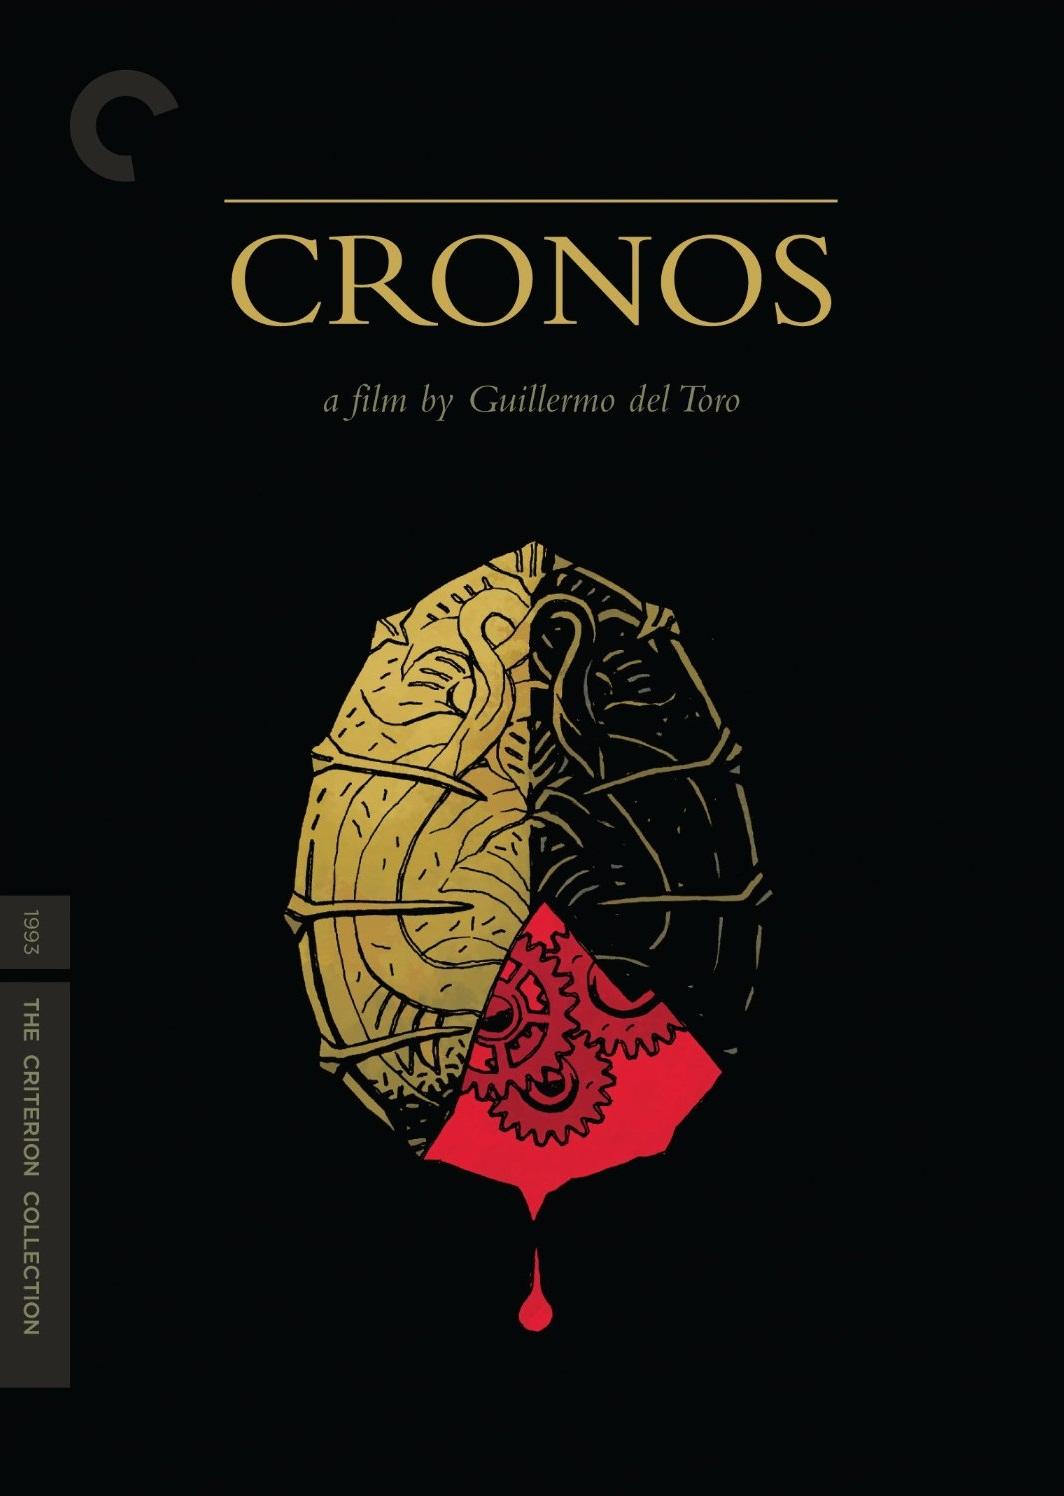 Cronos 1993